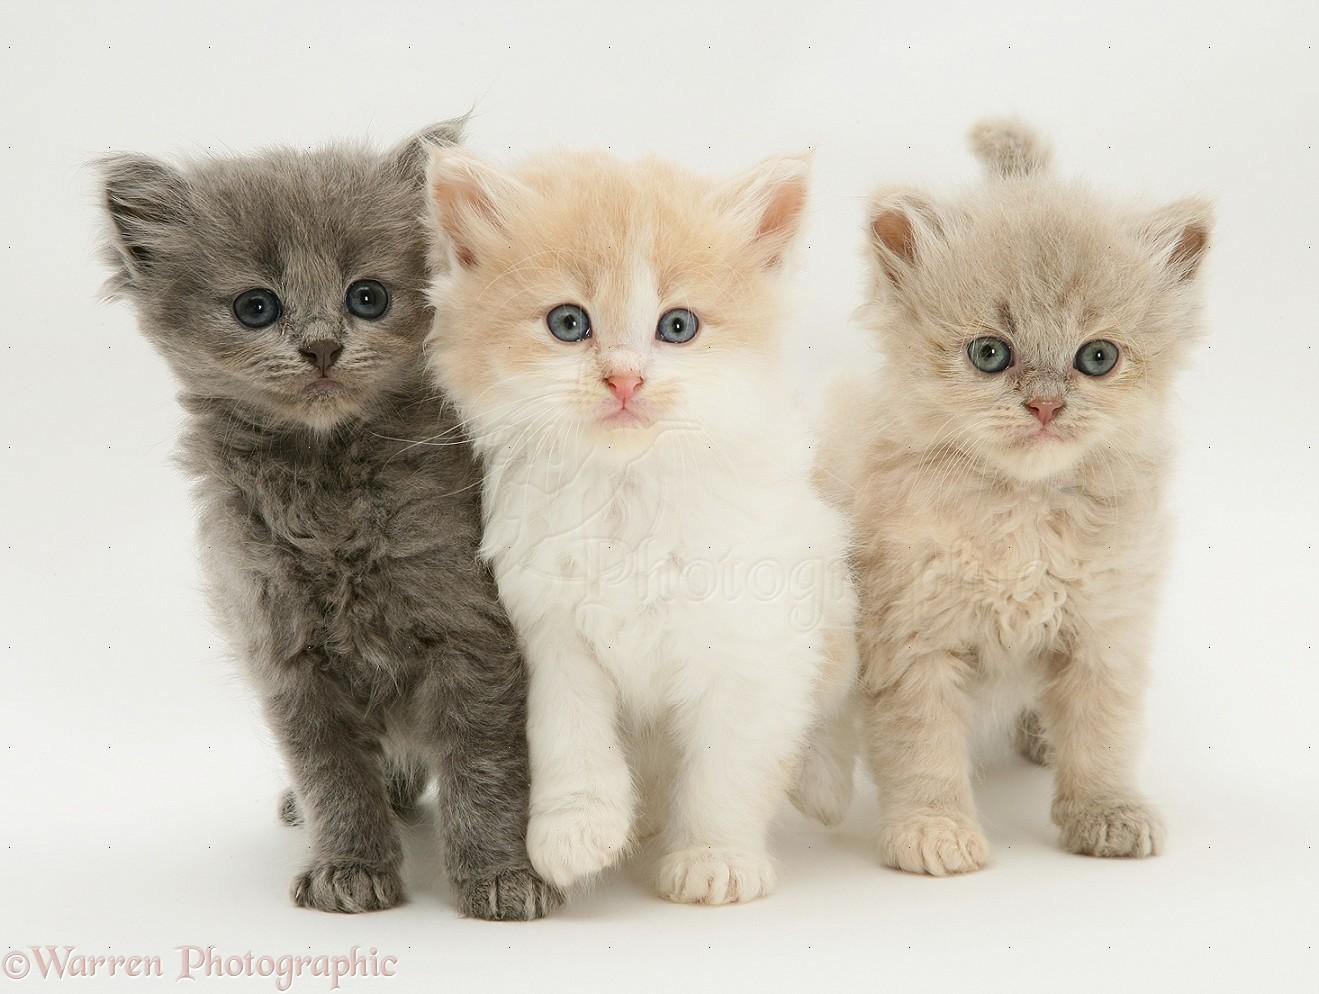 three cute kittens photo wp10371